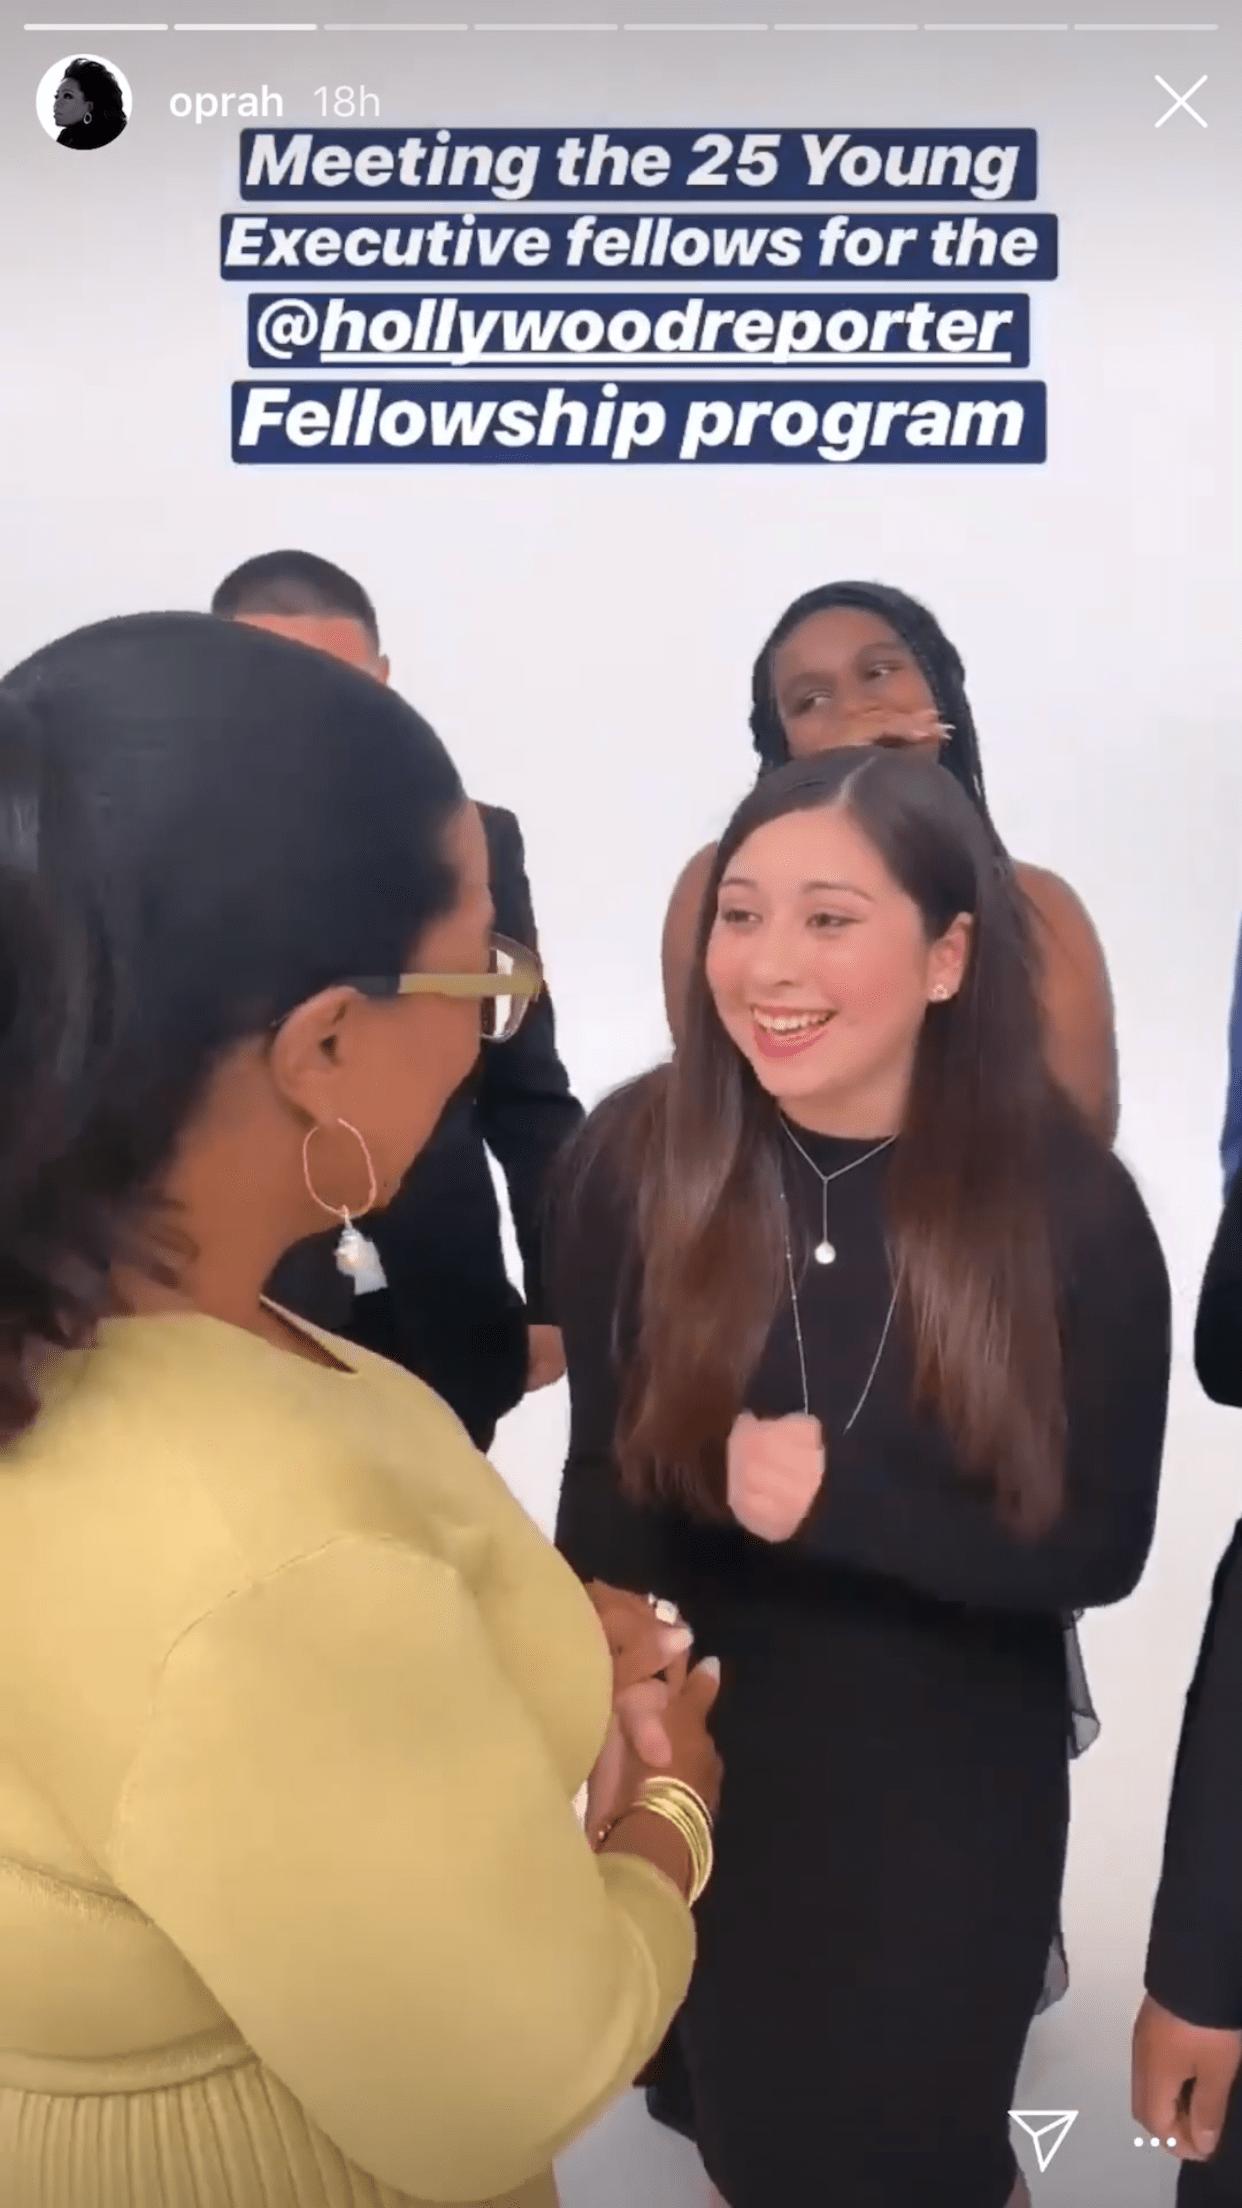 Sophomore, Ariana Morataya-Cardenas with Oprah Winfrey